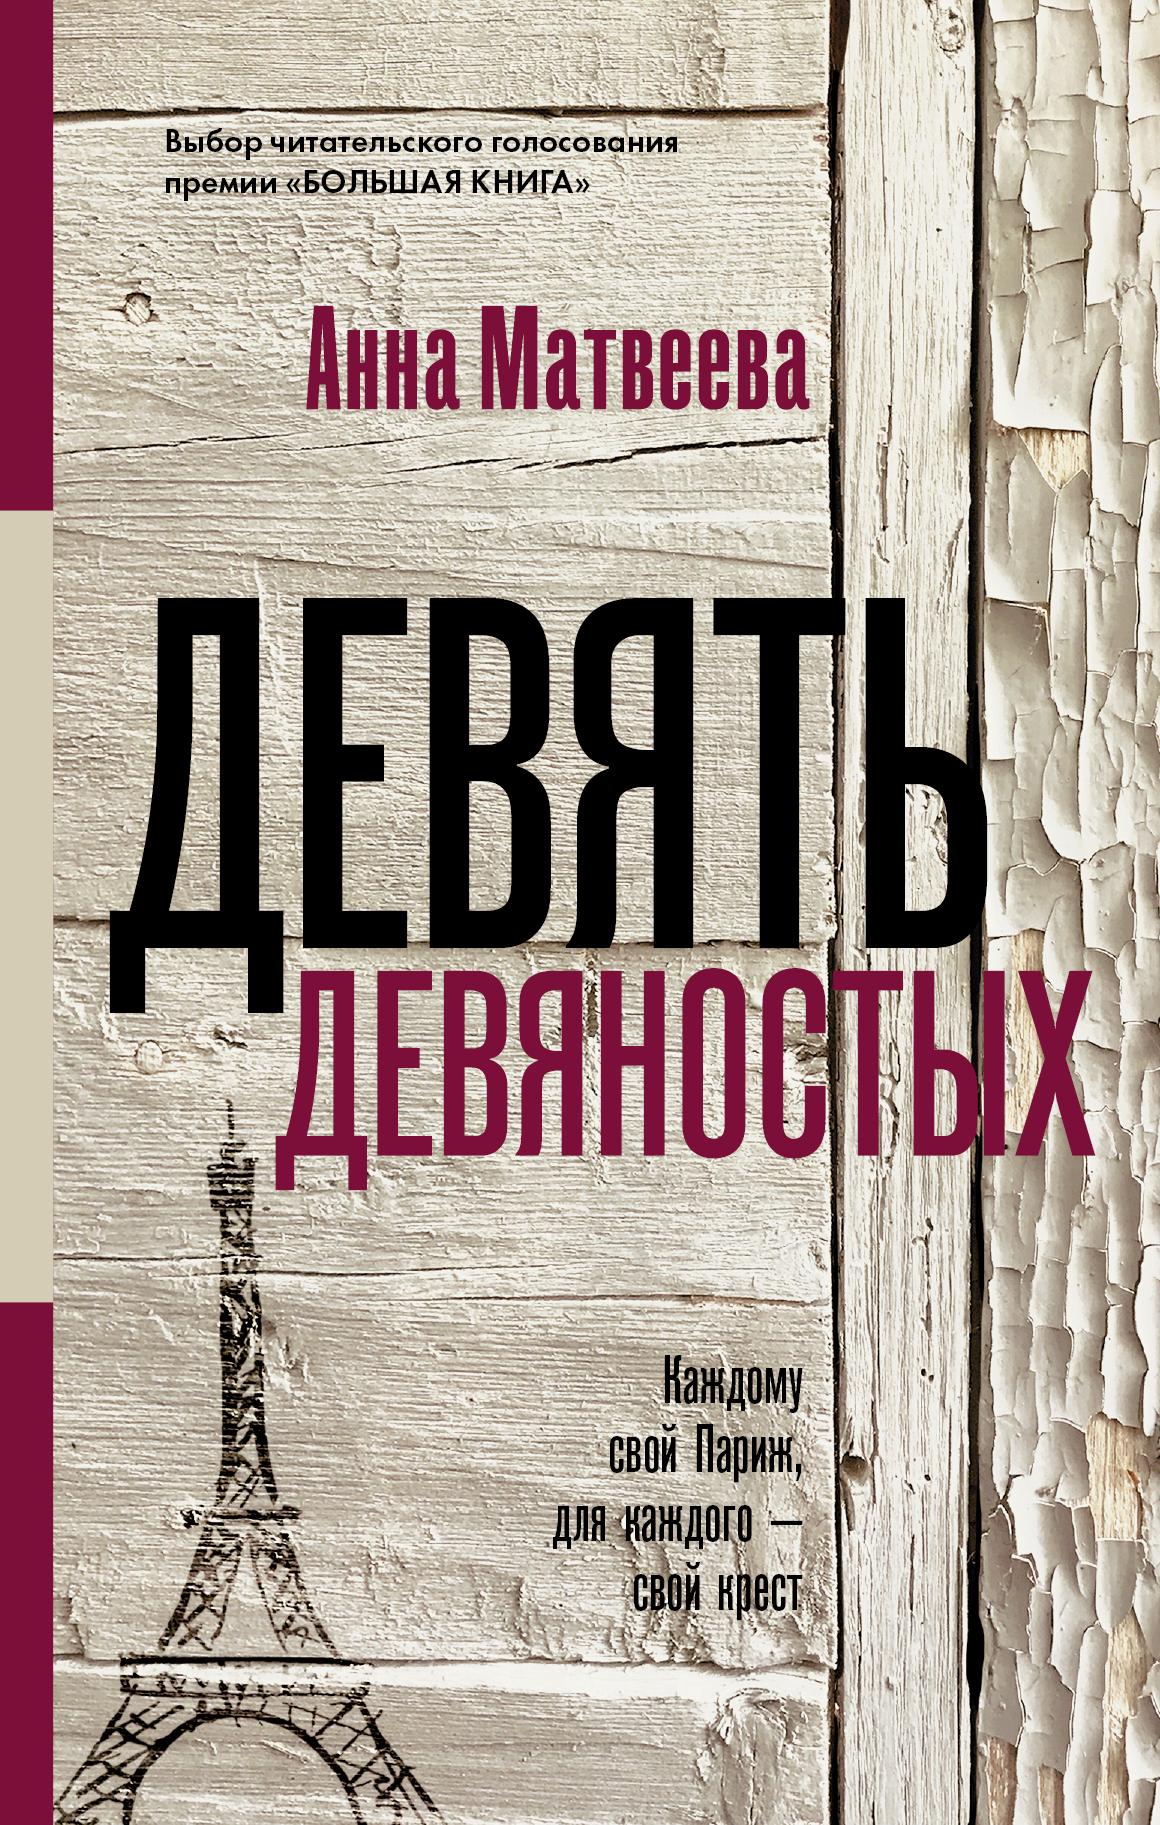 Анна Матвеева Девять девяностых